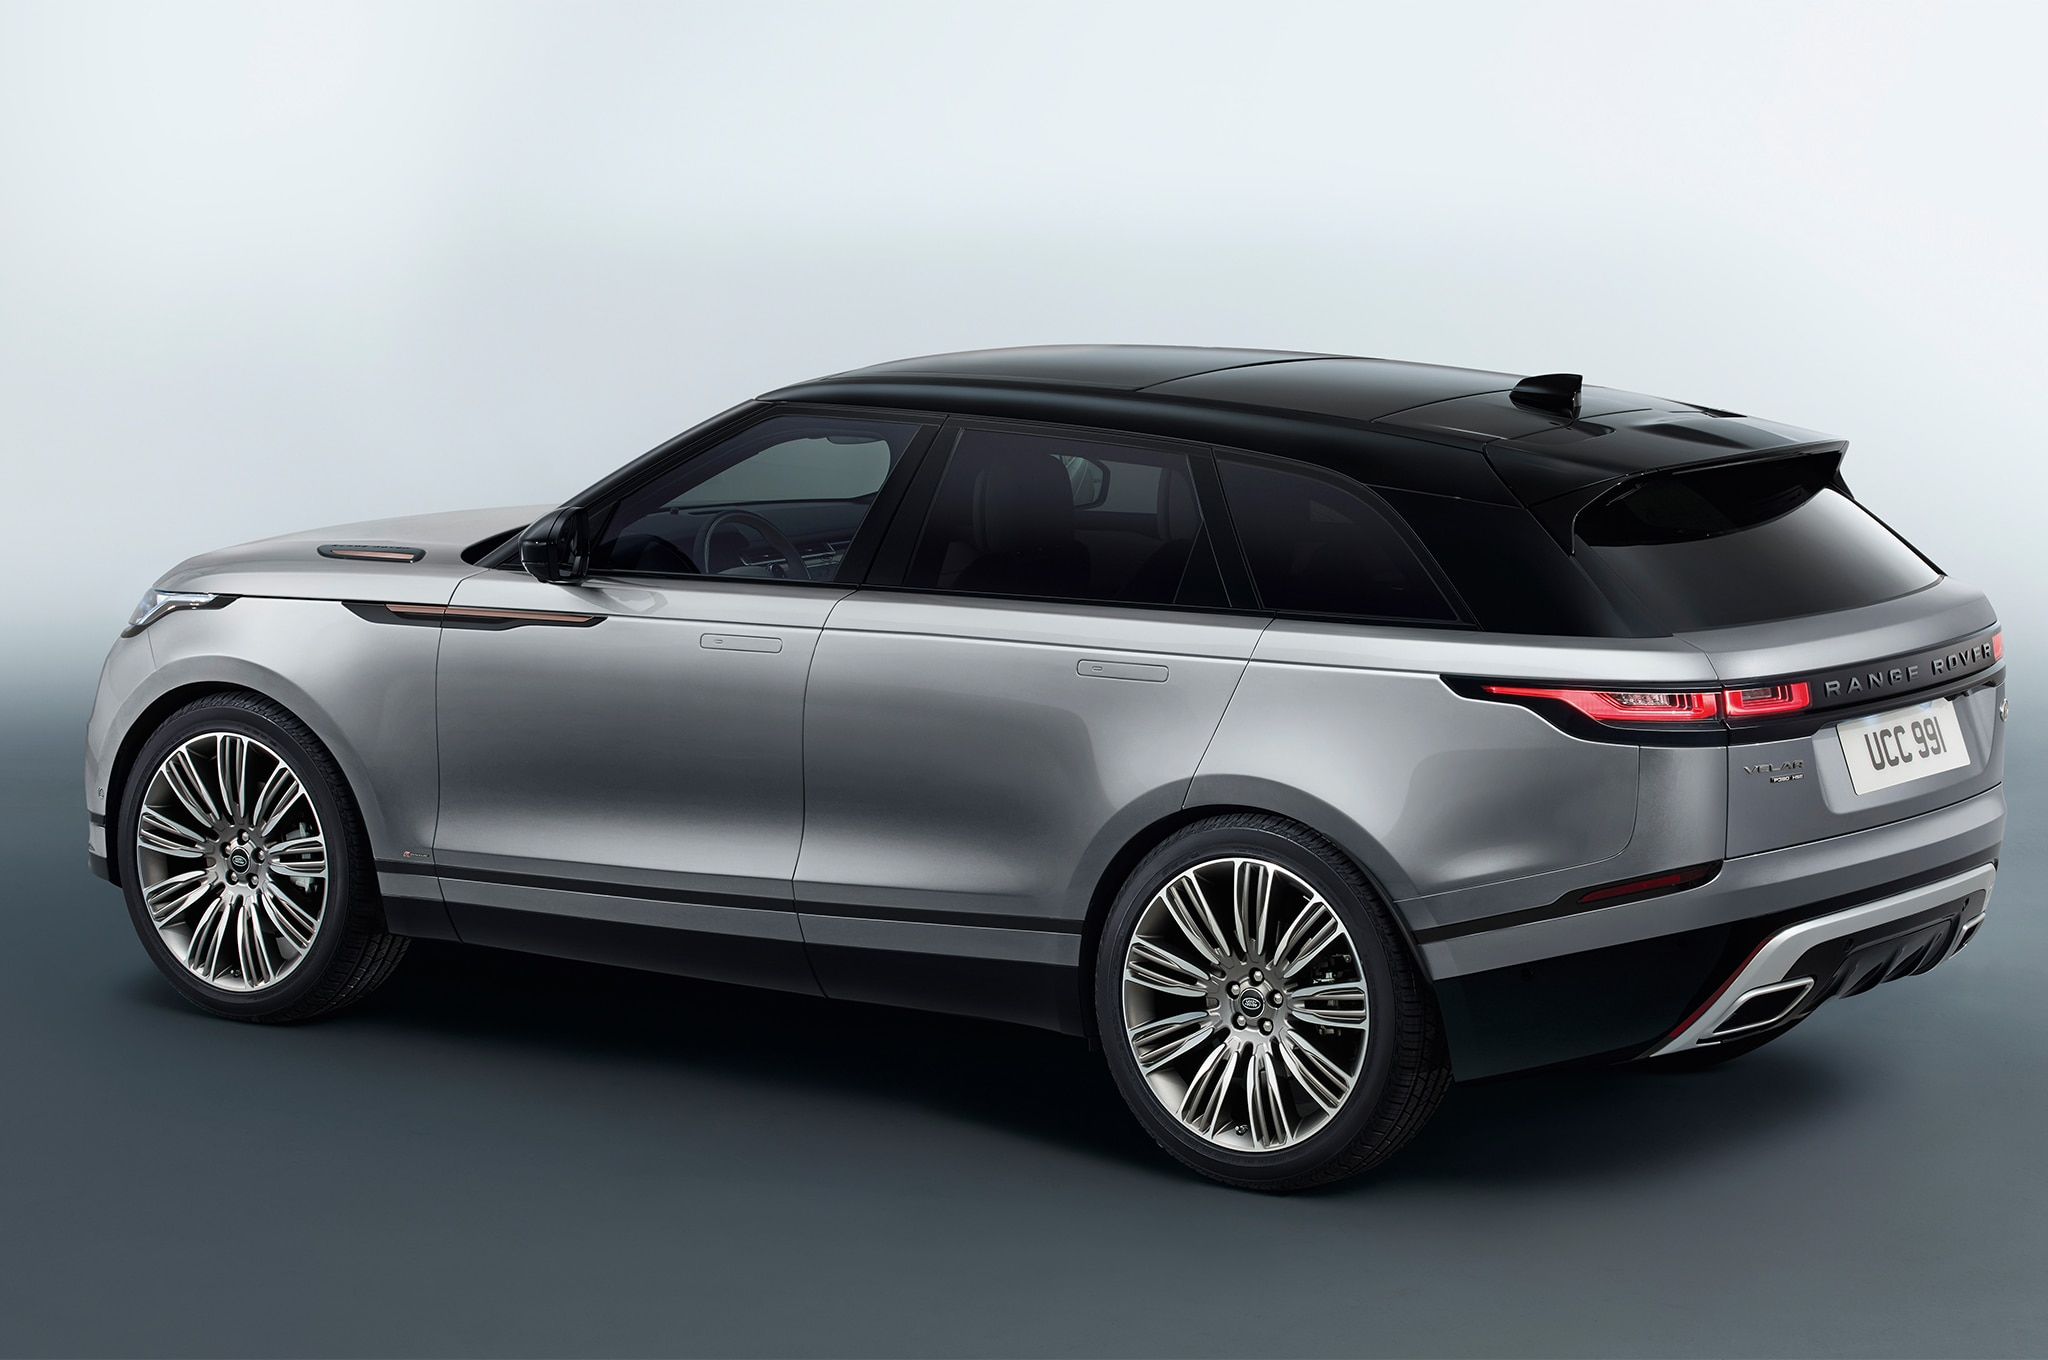 2018 range rover velar first drive review automobile. Black Bedroom Furniture Sets. Home Design Ideas